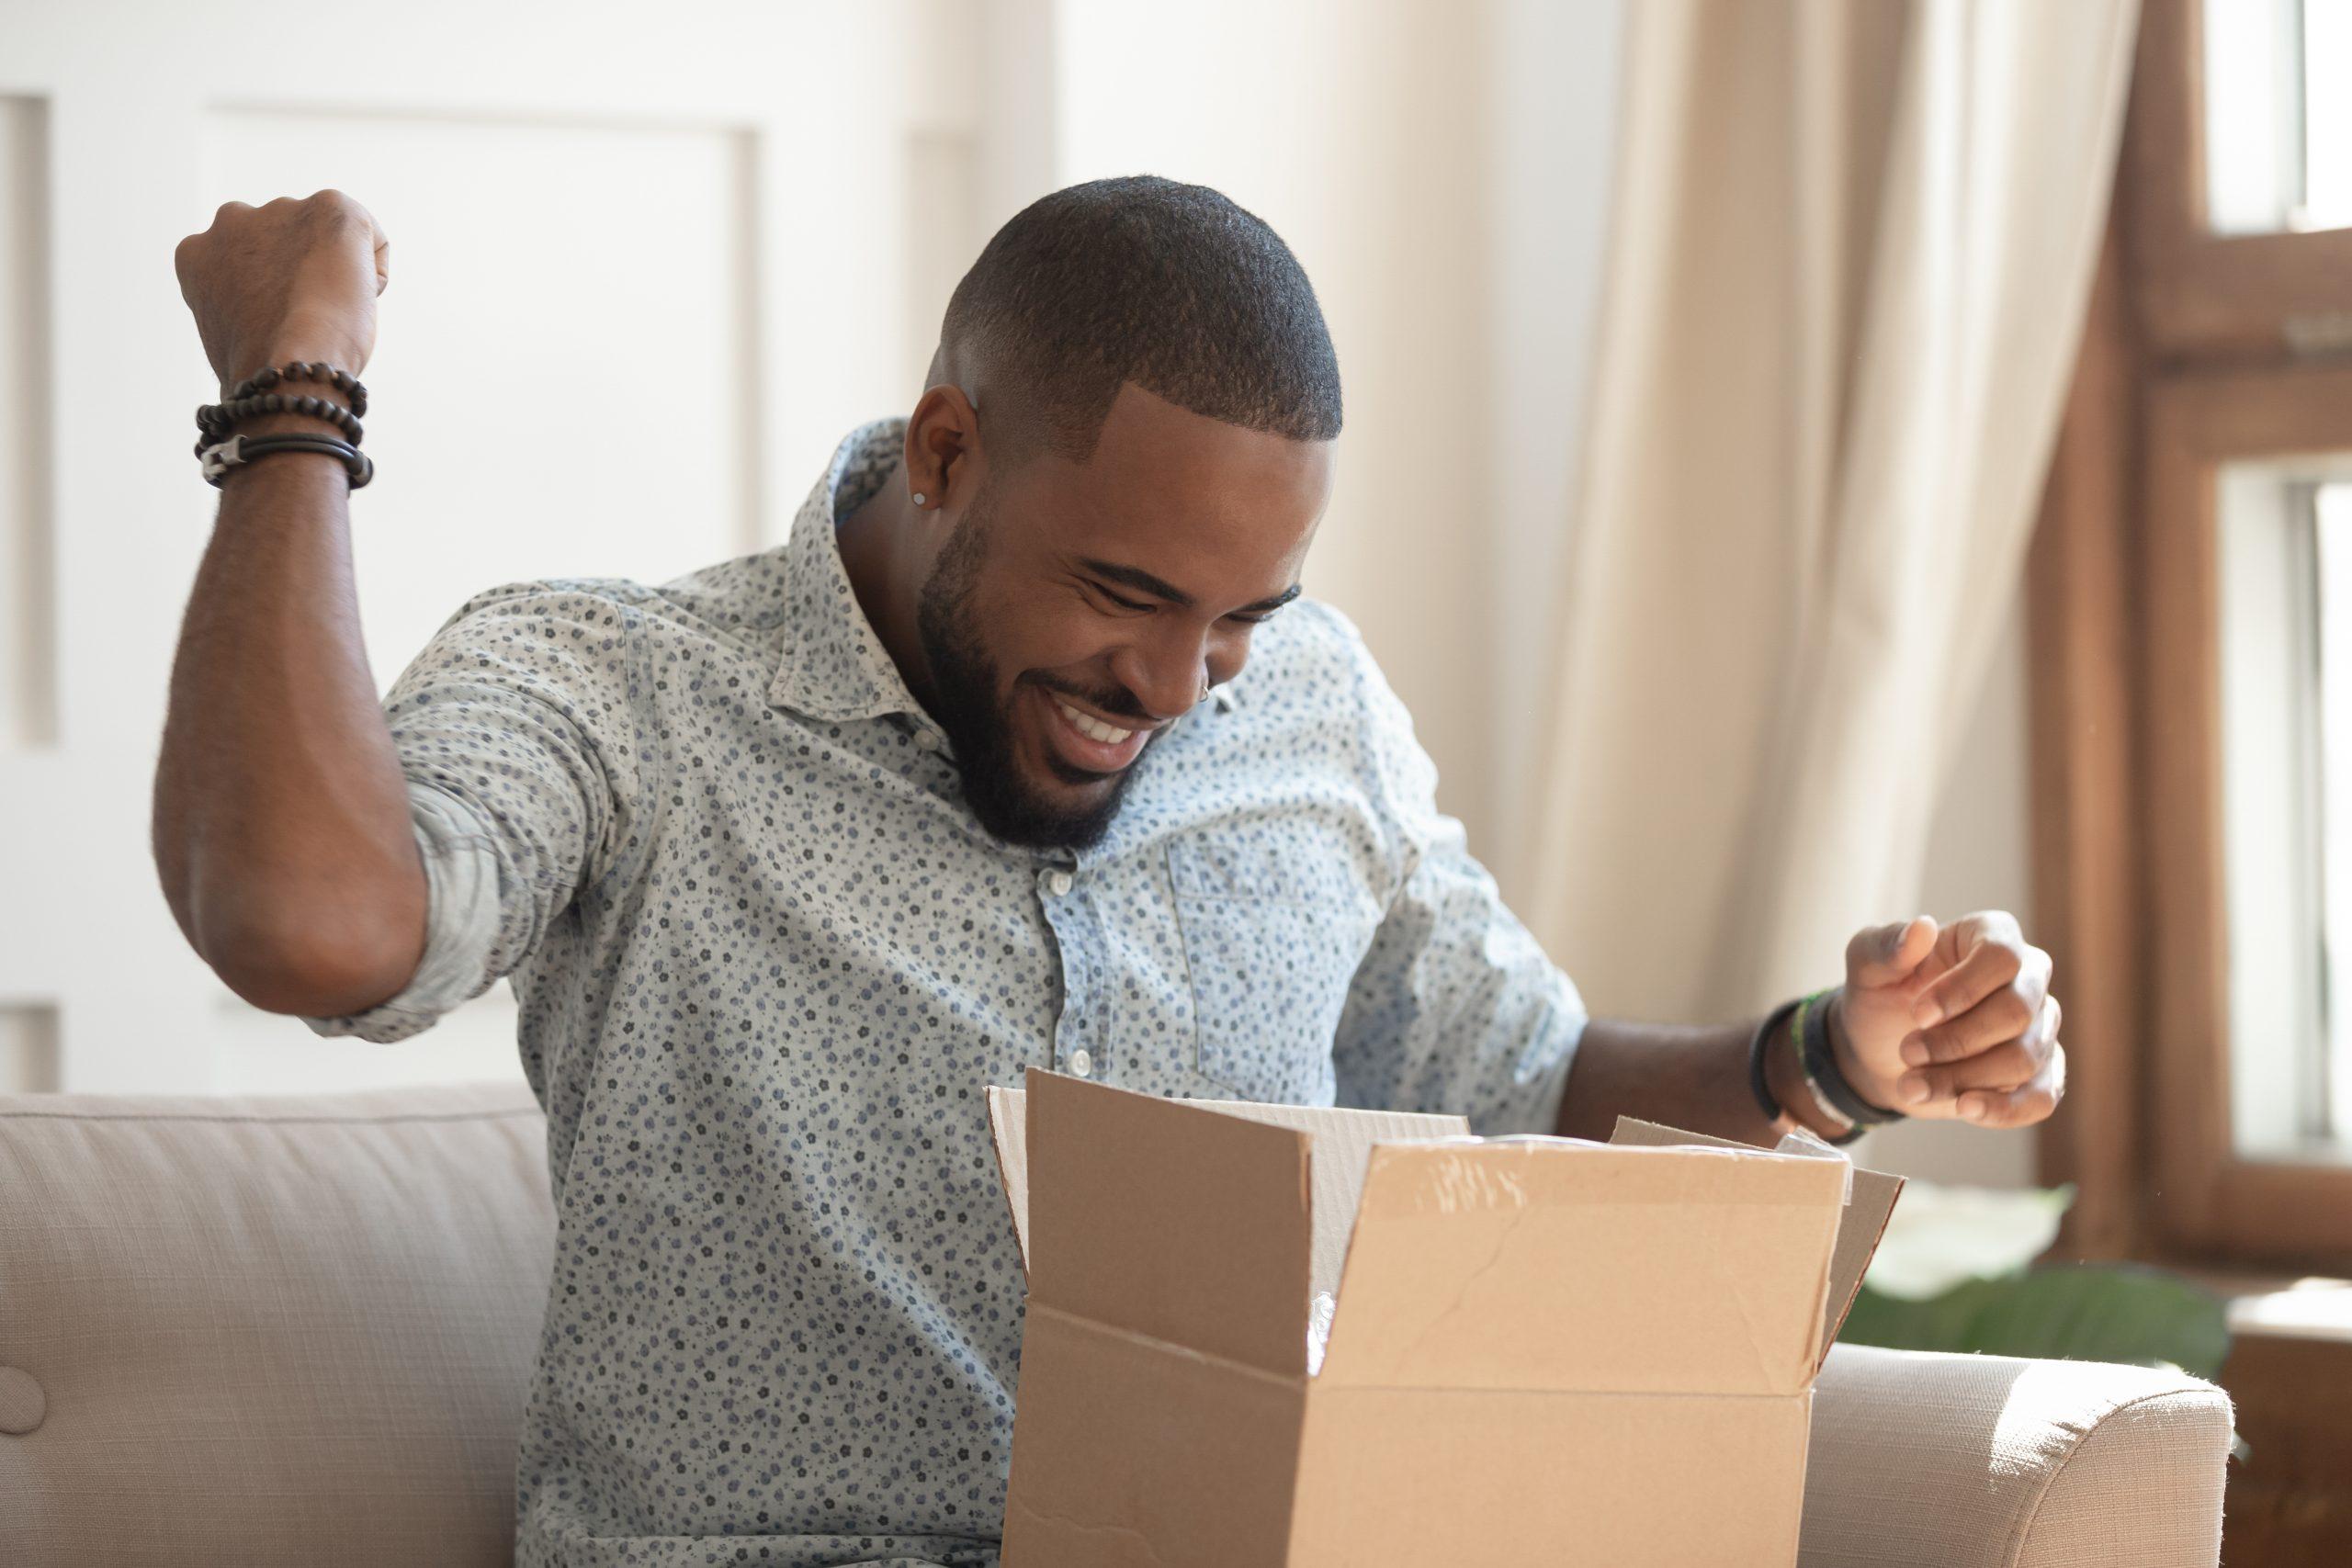 A happy man receiving his parcel